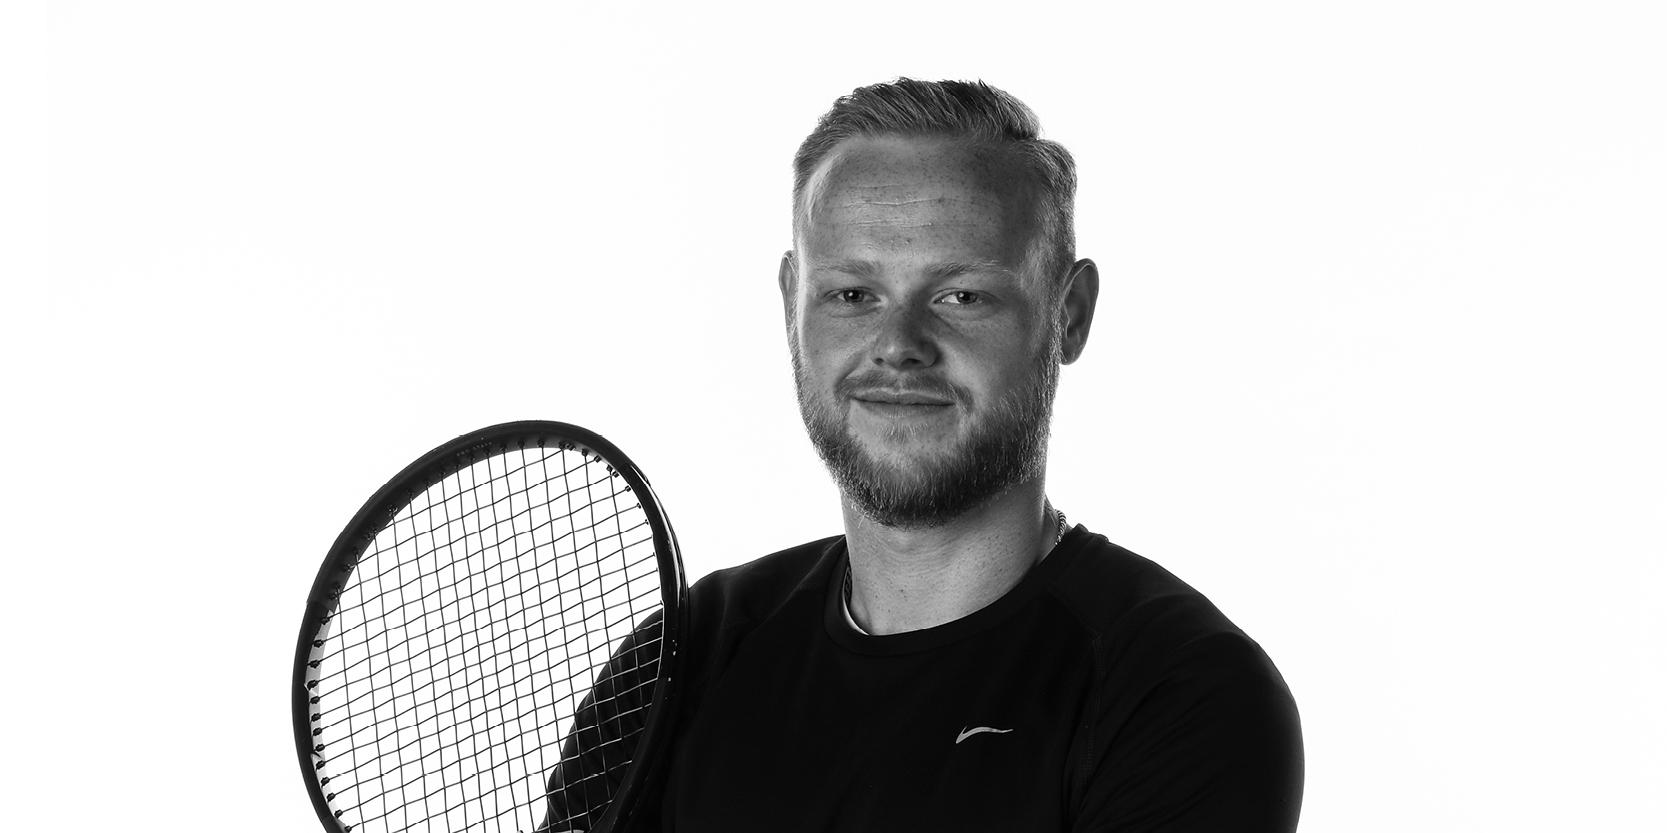 racquets-04